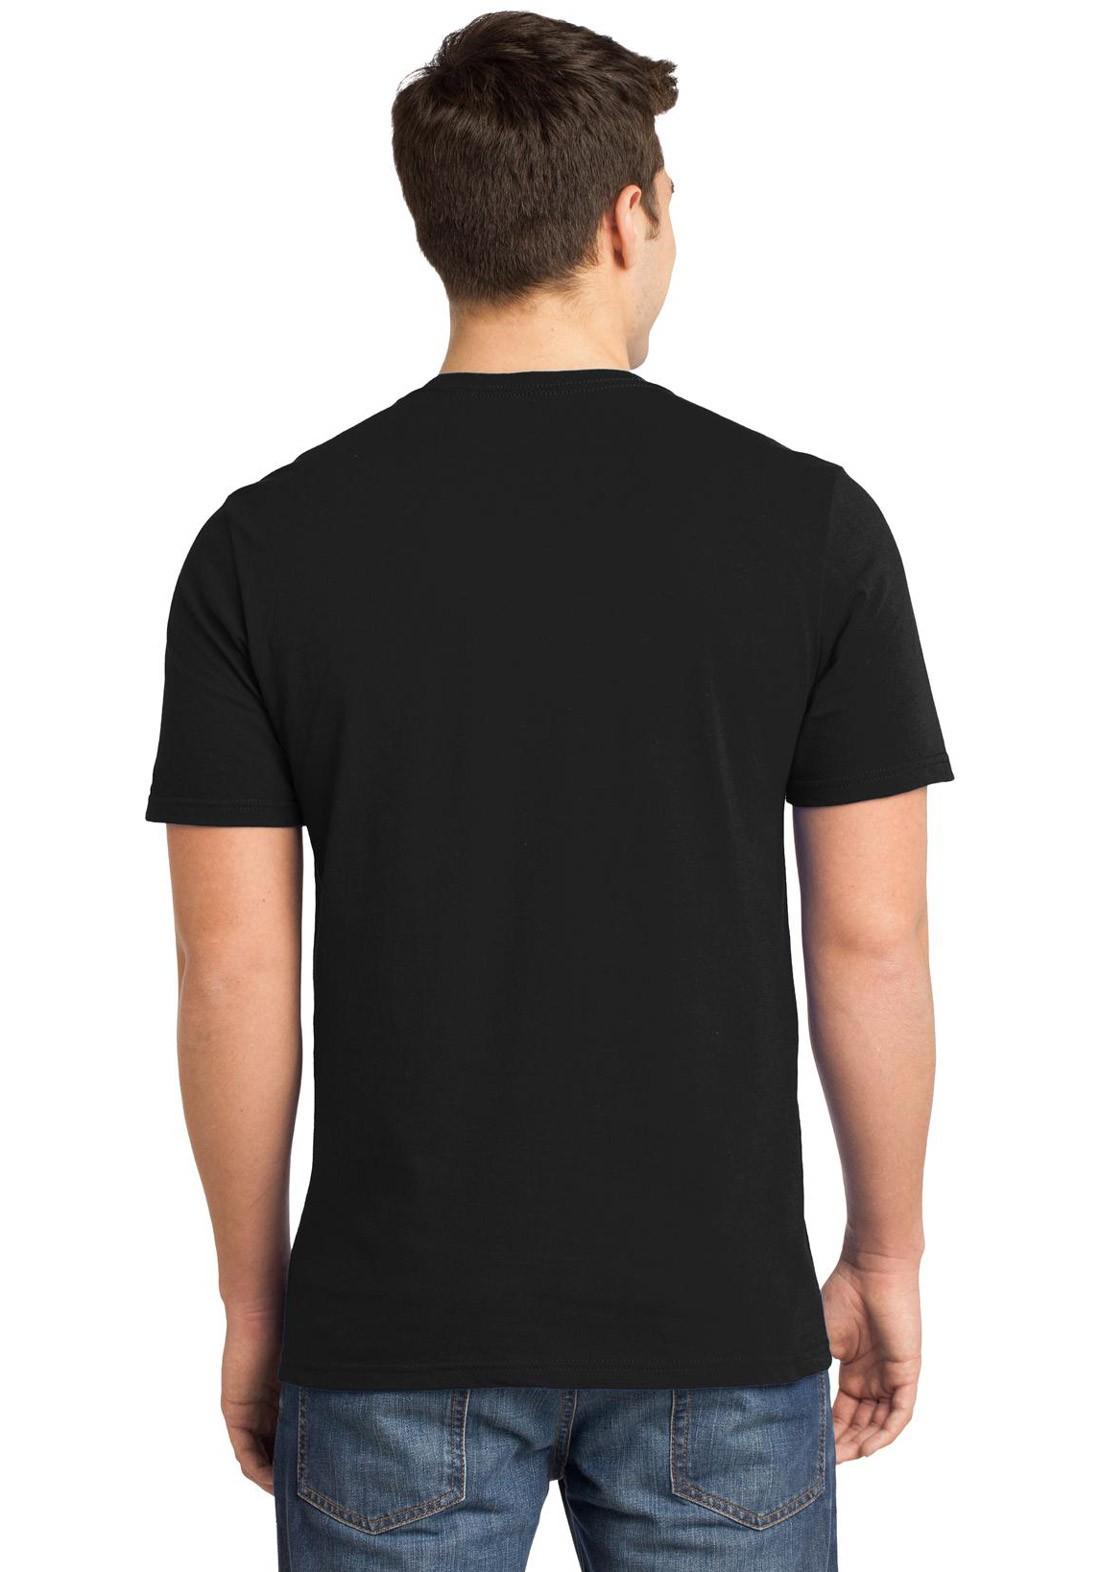 Camiseta Masculina Universitária Faculdade Biologia